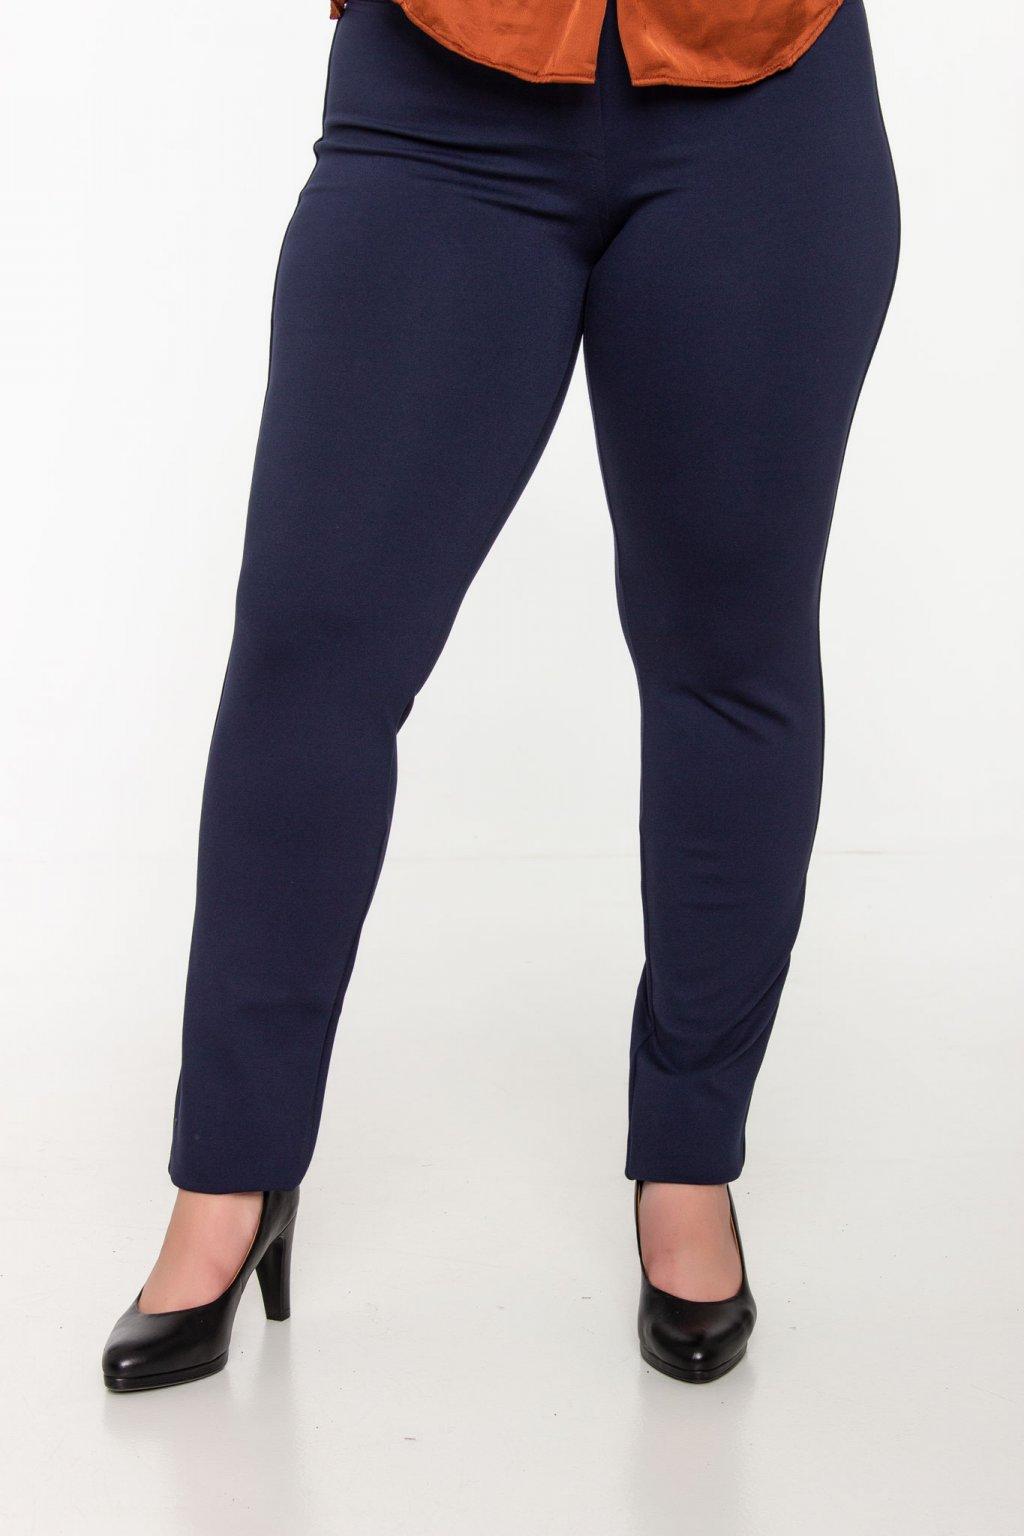 Marianna nohavice modré